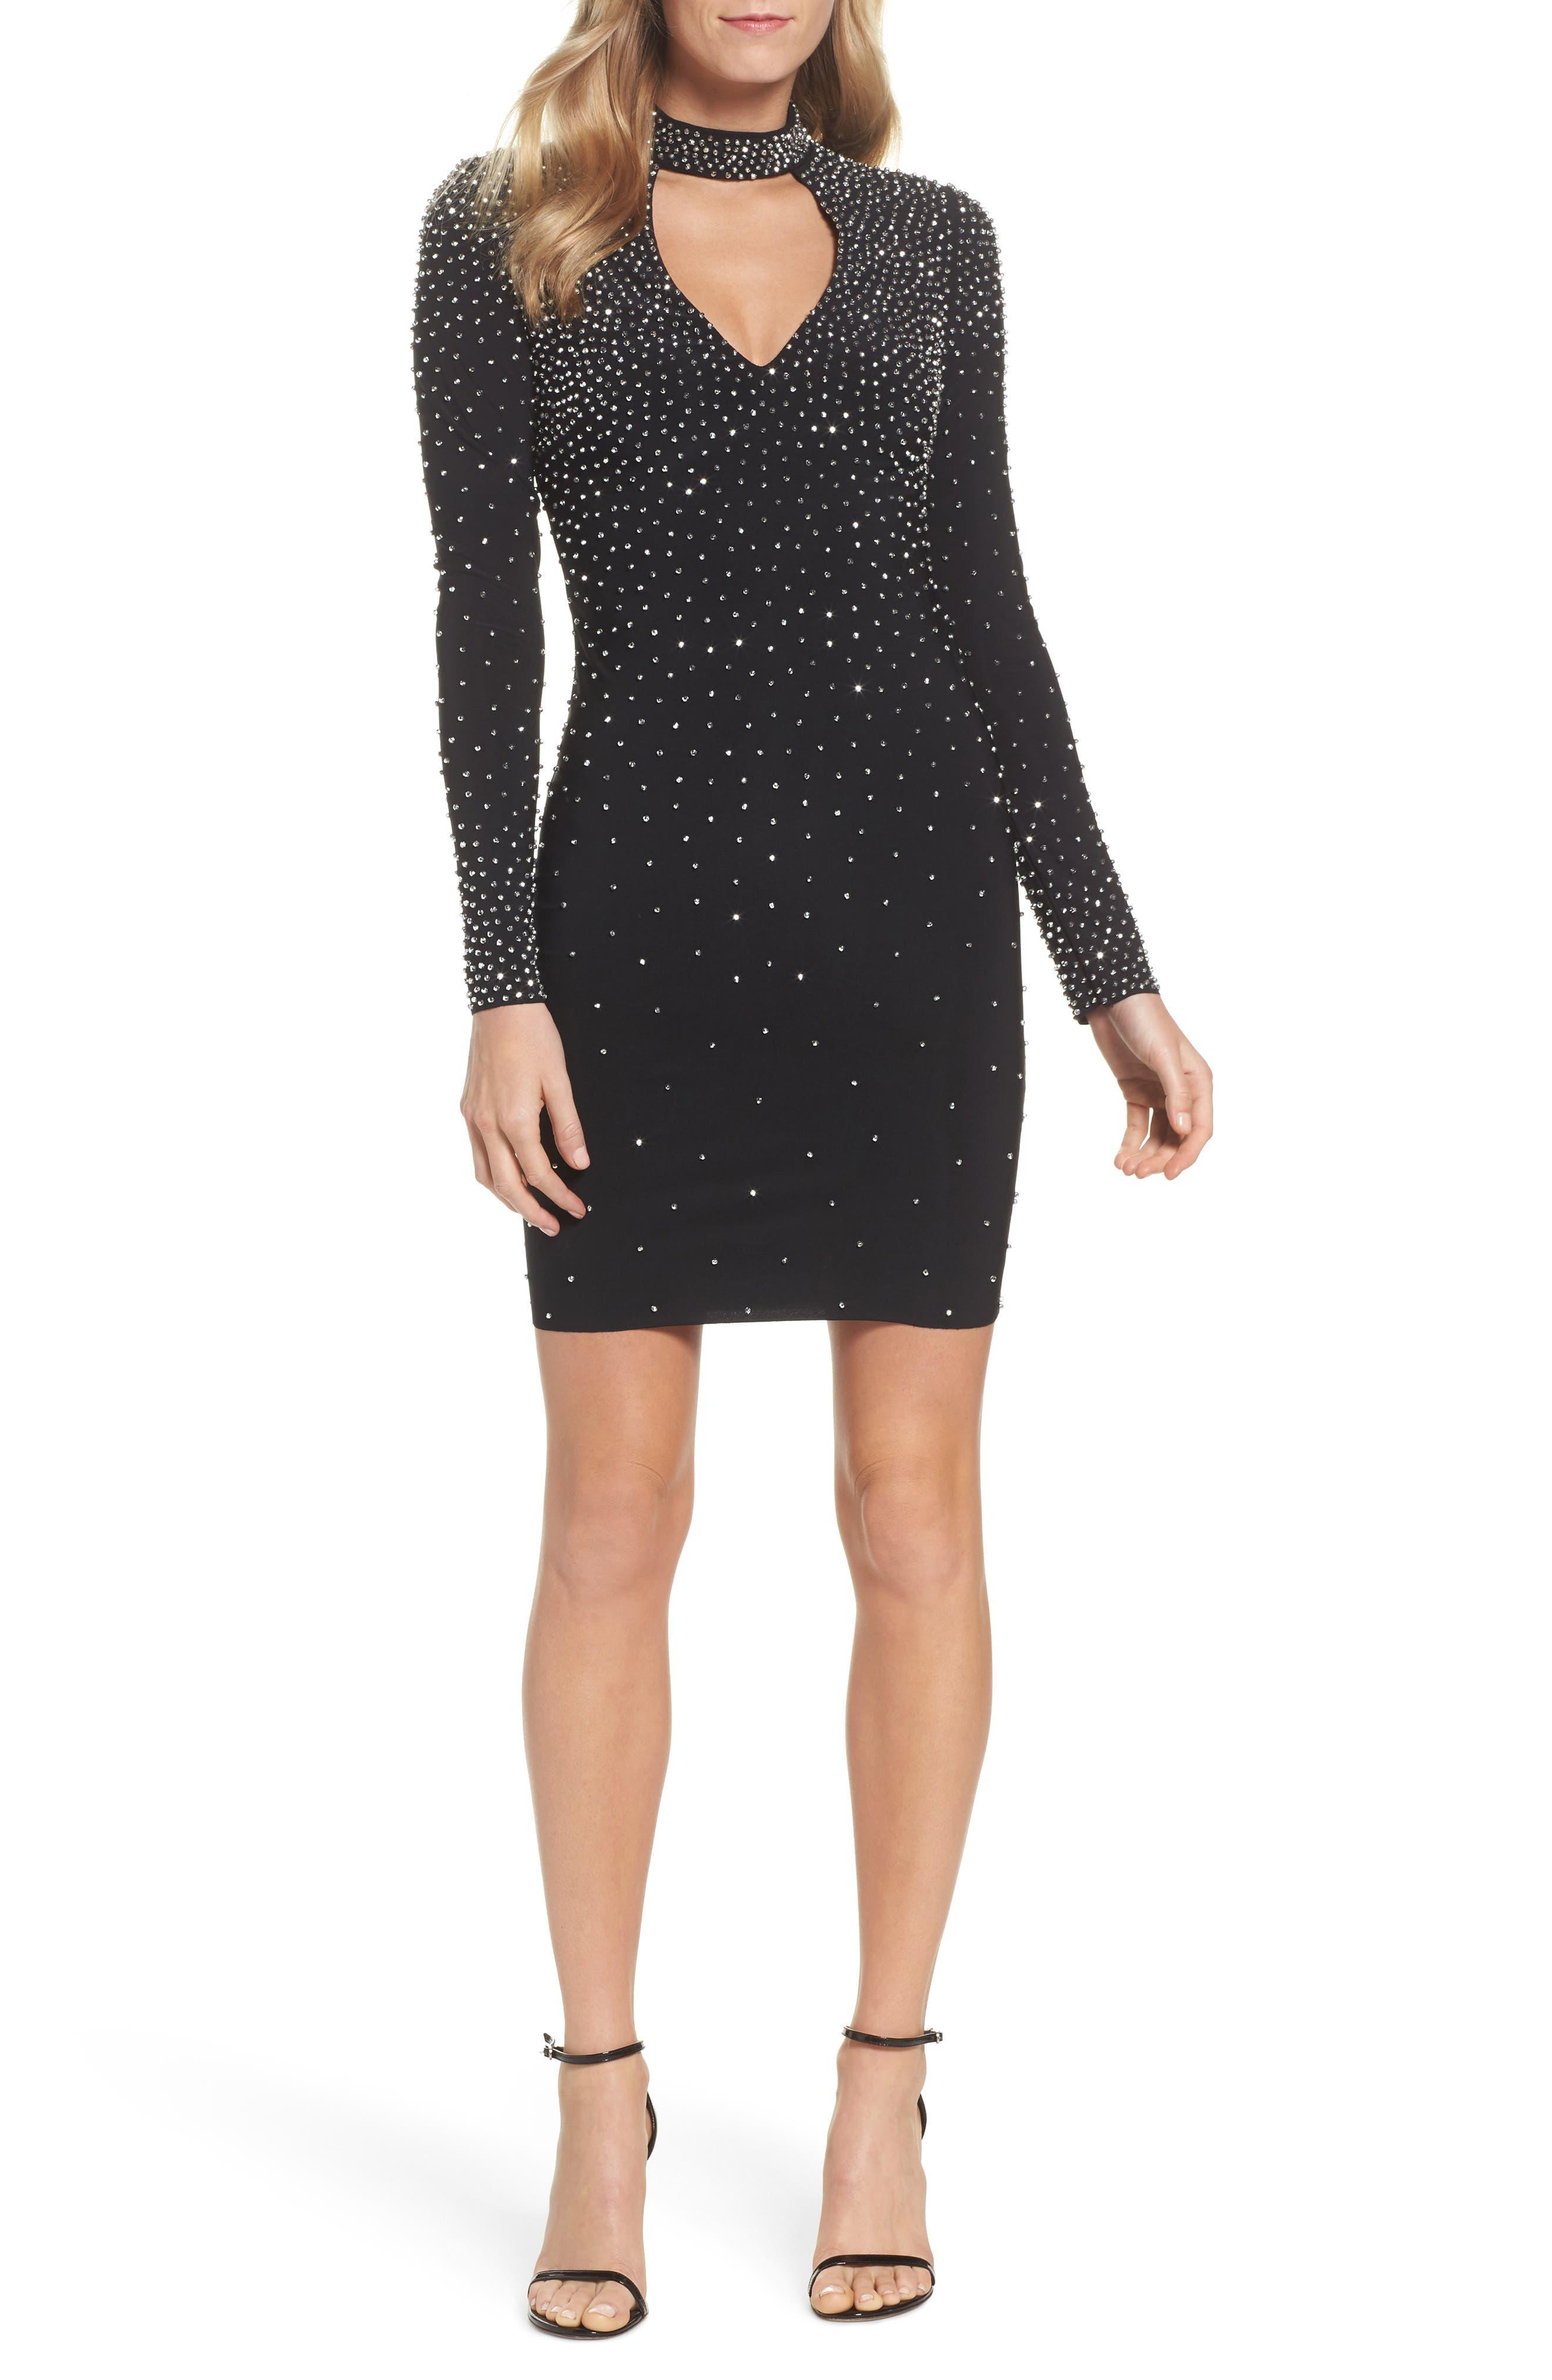 Main Image - Xscape Embellished Choker Neck Body-Con Dress